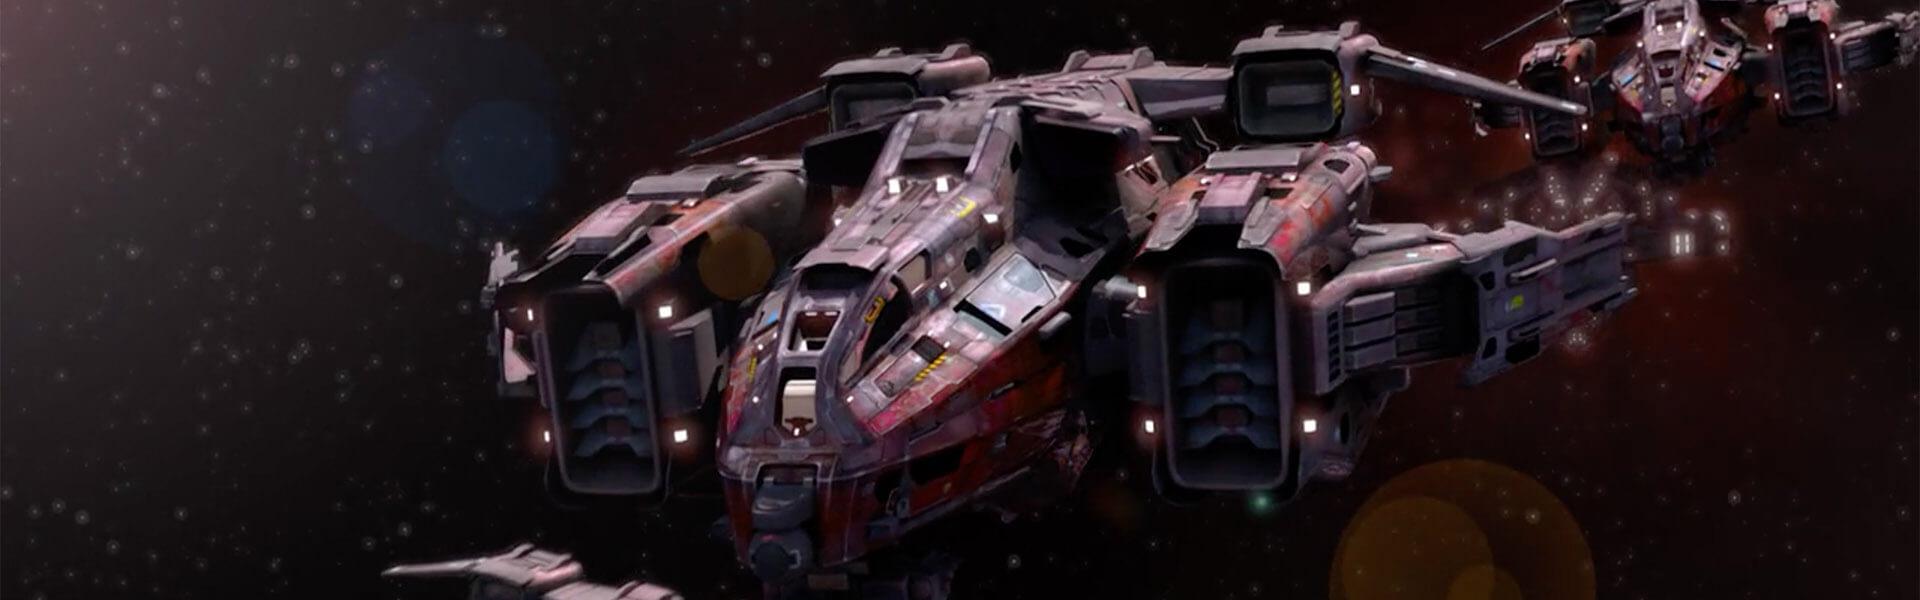 CGI Spaceship Image